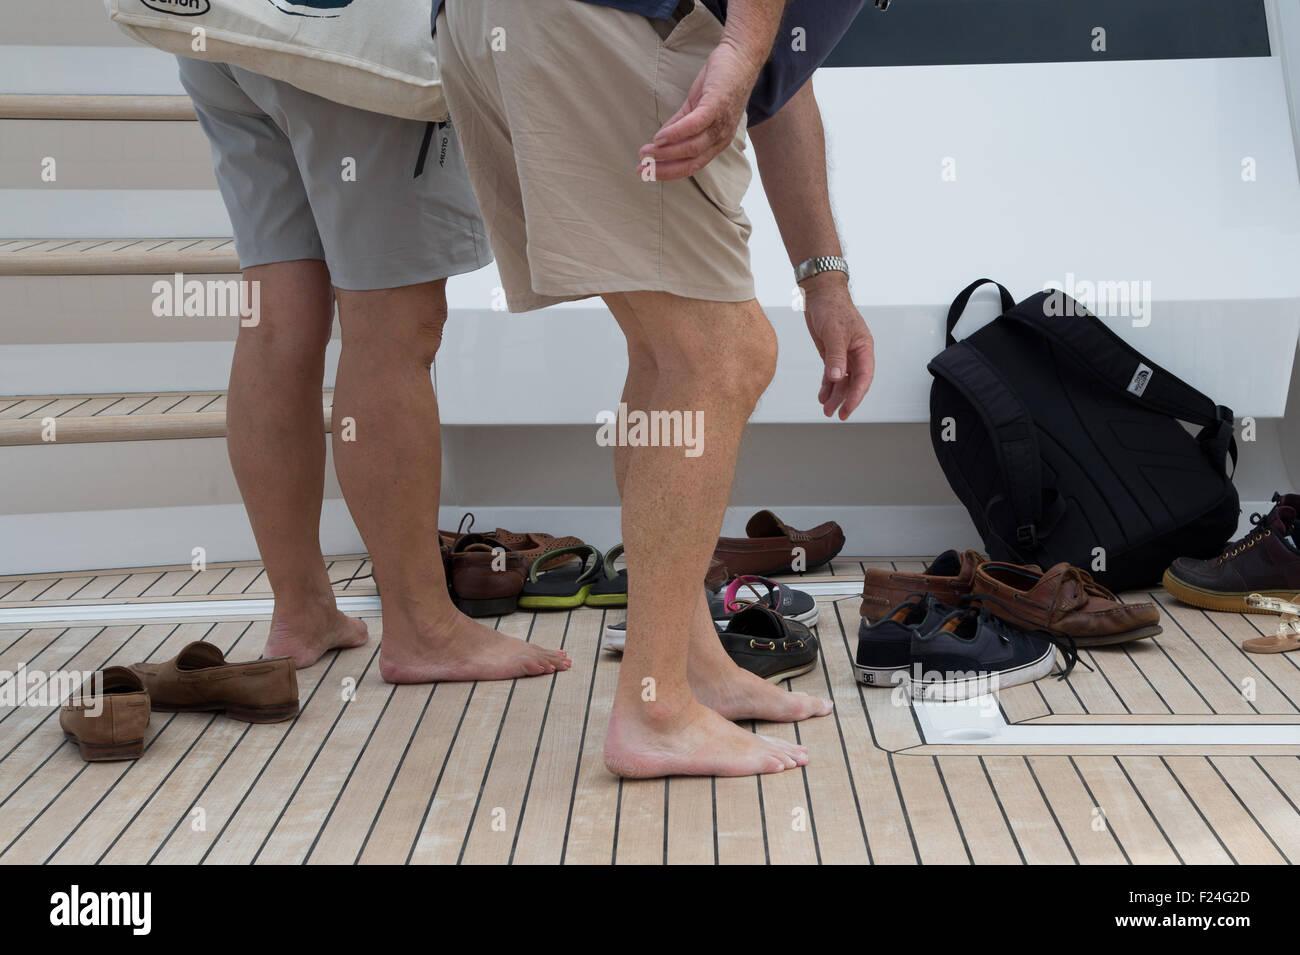 Southampton, UK. 11. September 2015. Southampton Boat Show 2015. Besucher sammeln ihre Schuhe nach dem Anzeigen Stockfoto